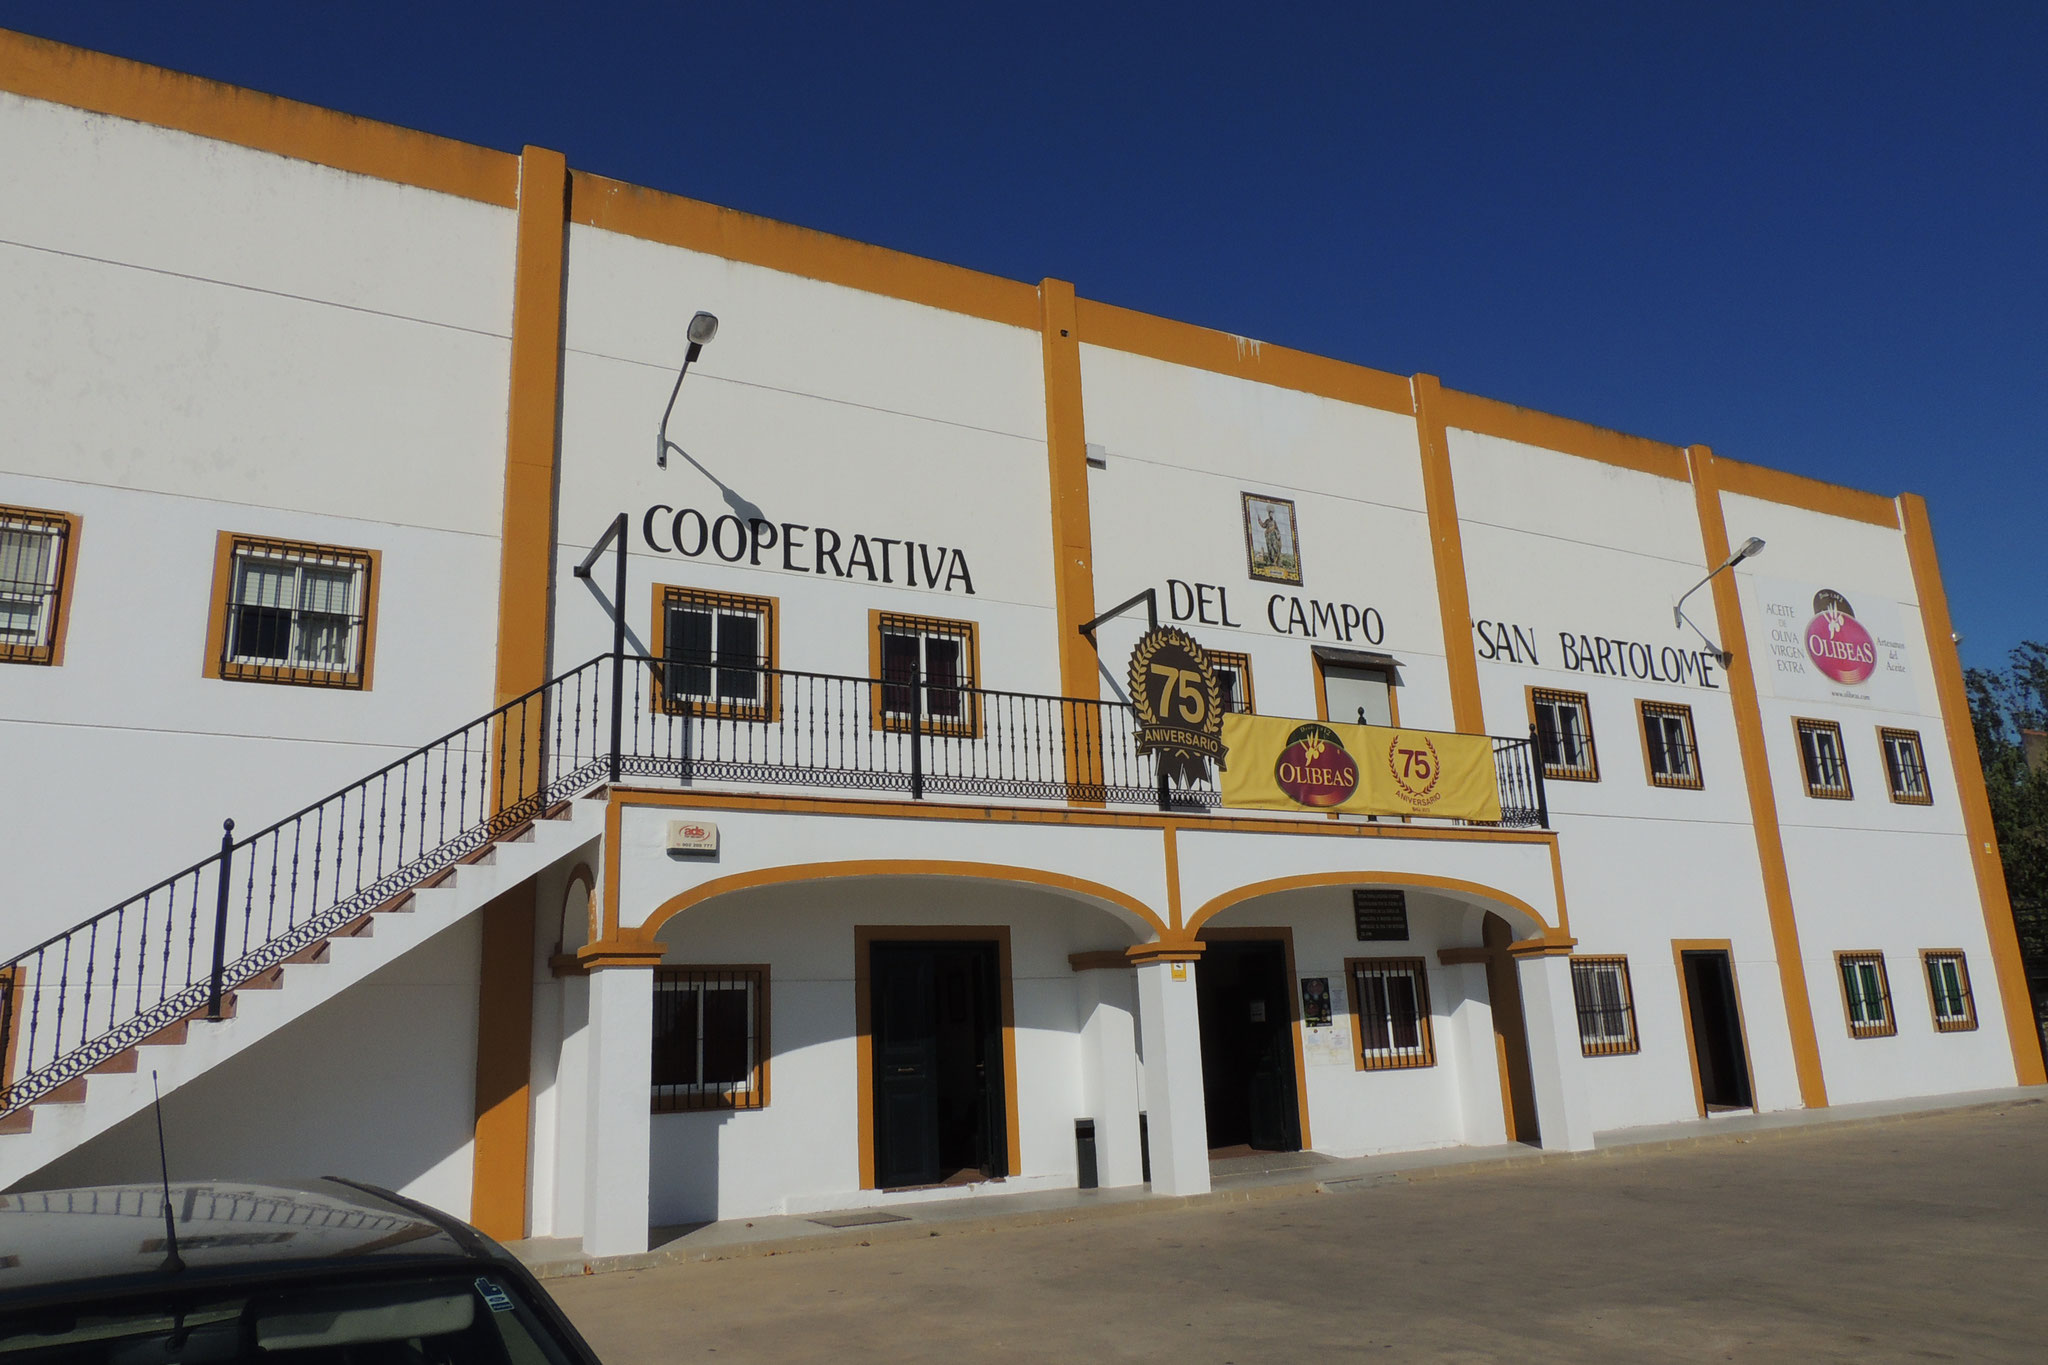 Cooperativa de Aceites de Oliva (Beas)